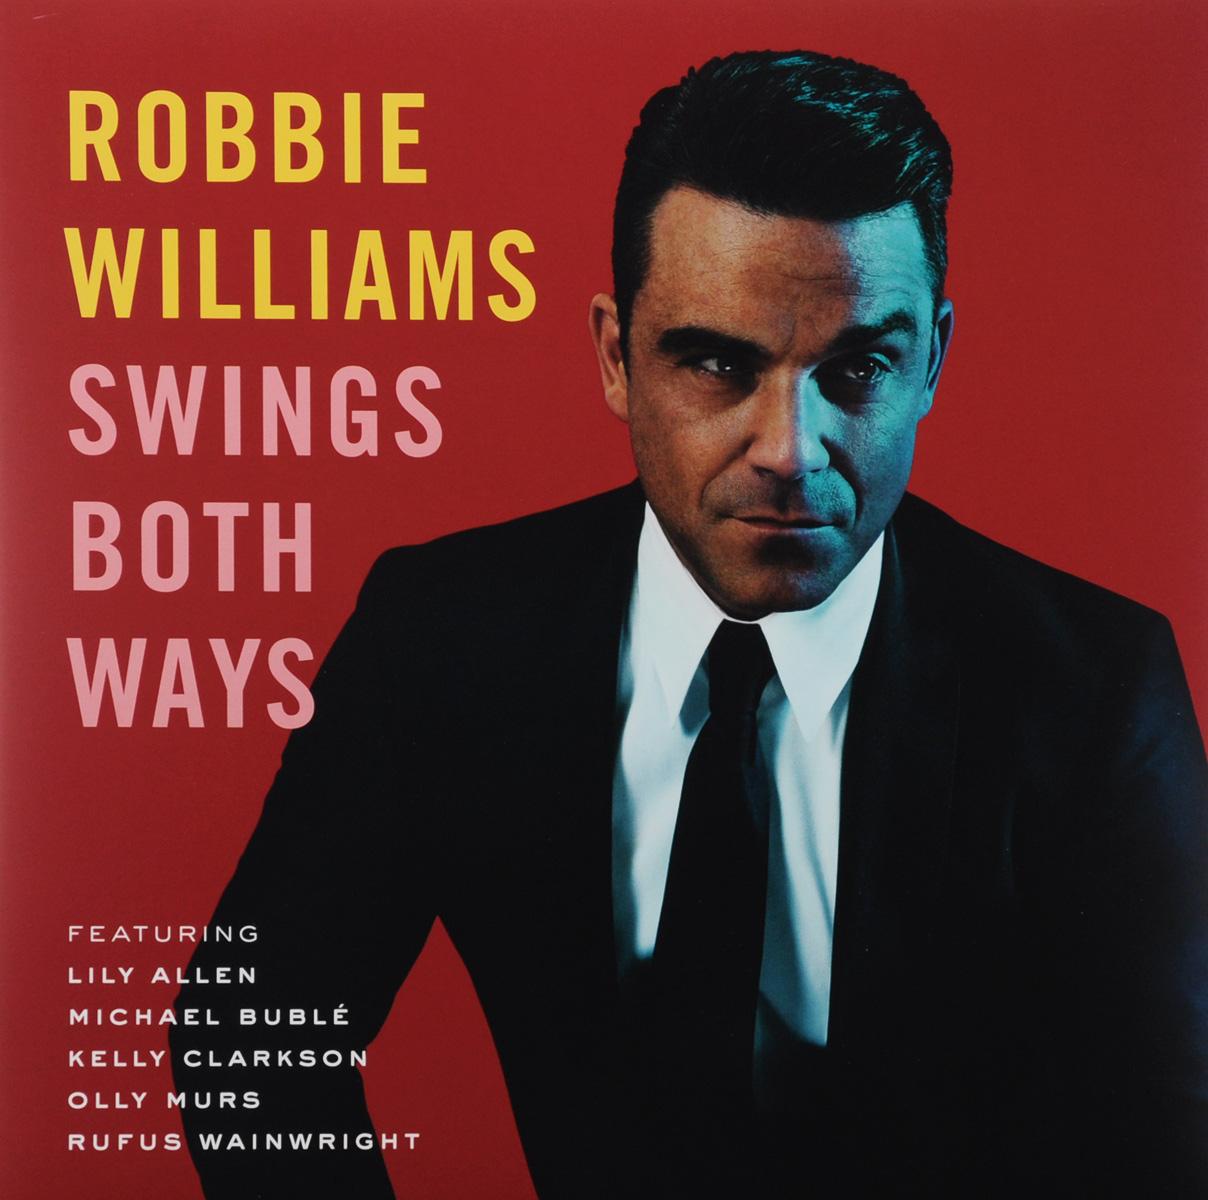 Робби Уильямс Robbie Williams. Swings Both Ways. Limited Edition (2 LP) робби уильямс верона